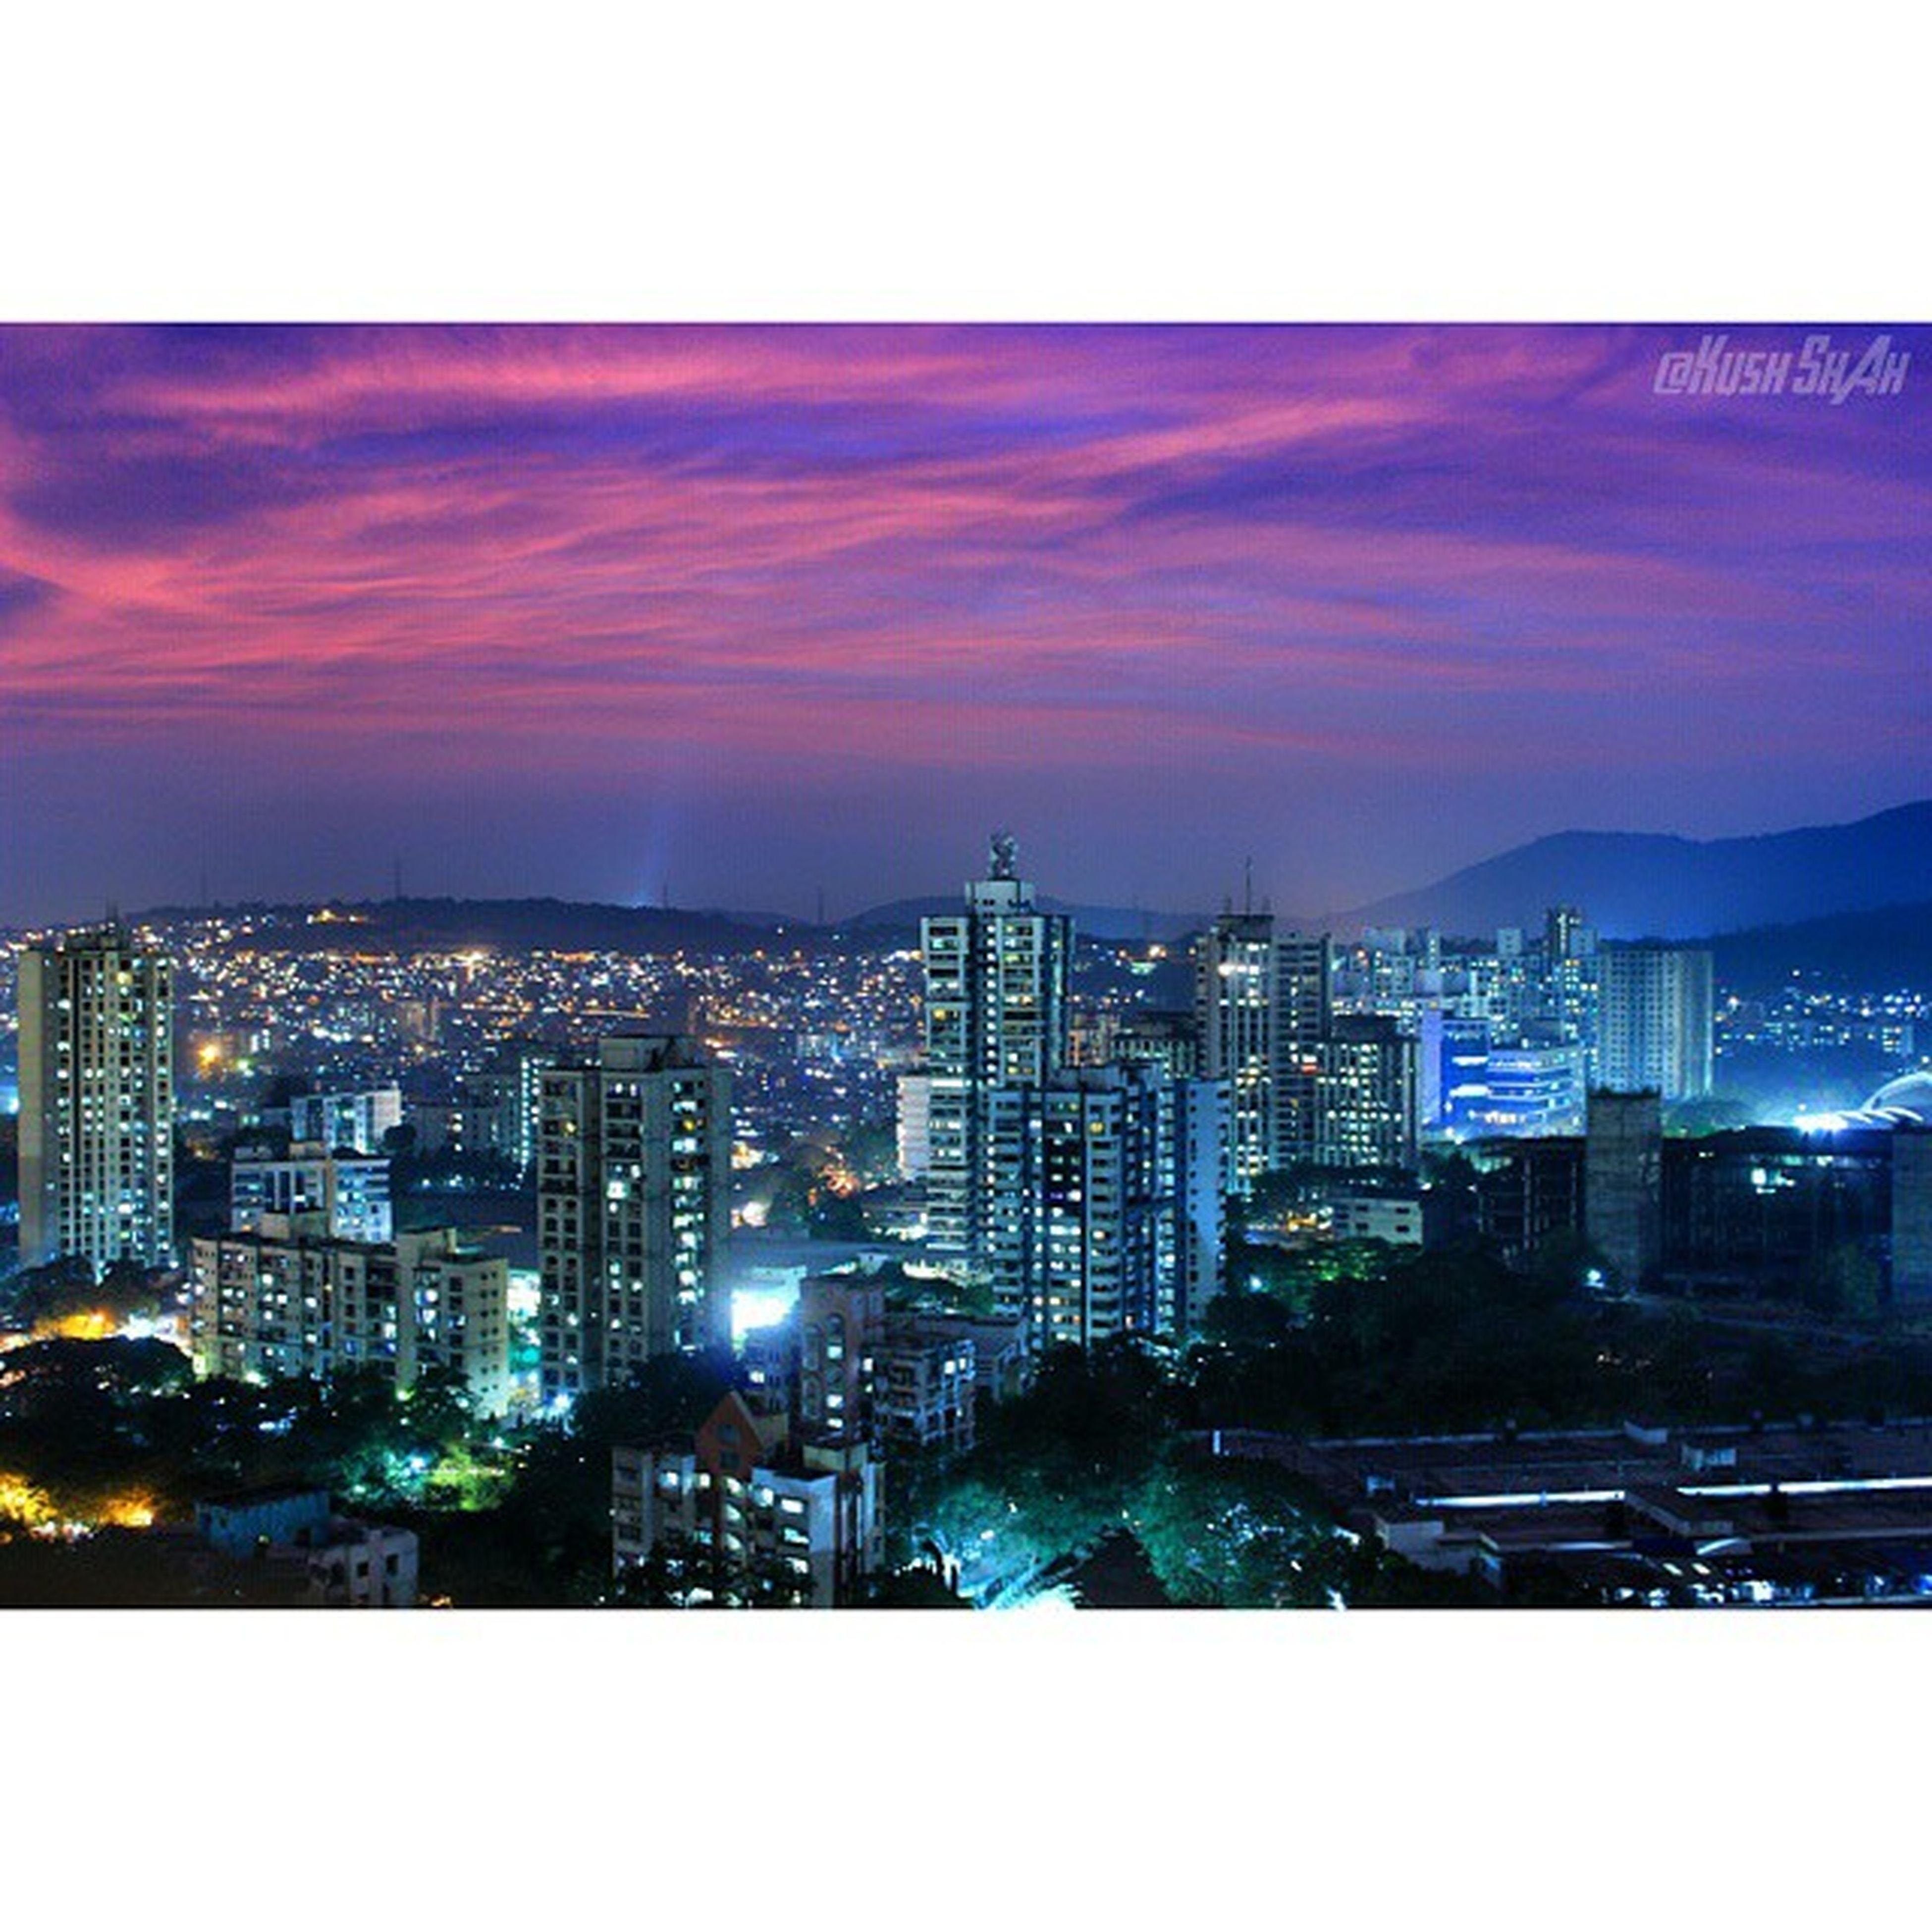 Hope is being able to see that there is light despite all of the darkness . . MumbaiDiaries Its_gram Aamchi_mumbai Clubofthephoto Mymumbai Our_bombay Lovely_mumbai Wearemumbai Longexpoevening Everydaymumbai Ig_indiashots The_3rd_eye Pics_capture Shutter_world Sarvodaya Bombayflare Black_boxes Mumbaikars_repost Itakegudphotos India_on_focus Mumbai_in_clicks Photographer_in_me Ig_decision Icu_global Ig_cameras_united mumbai mymumbai camofreakz photoist